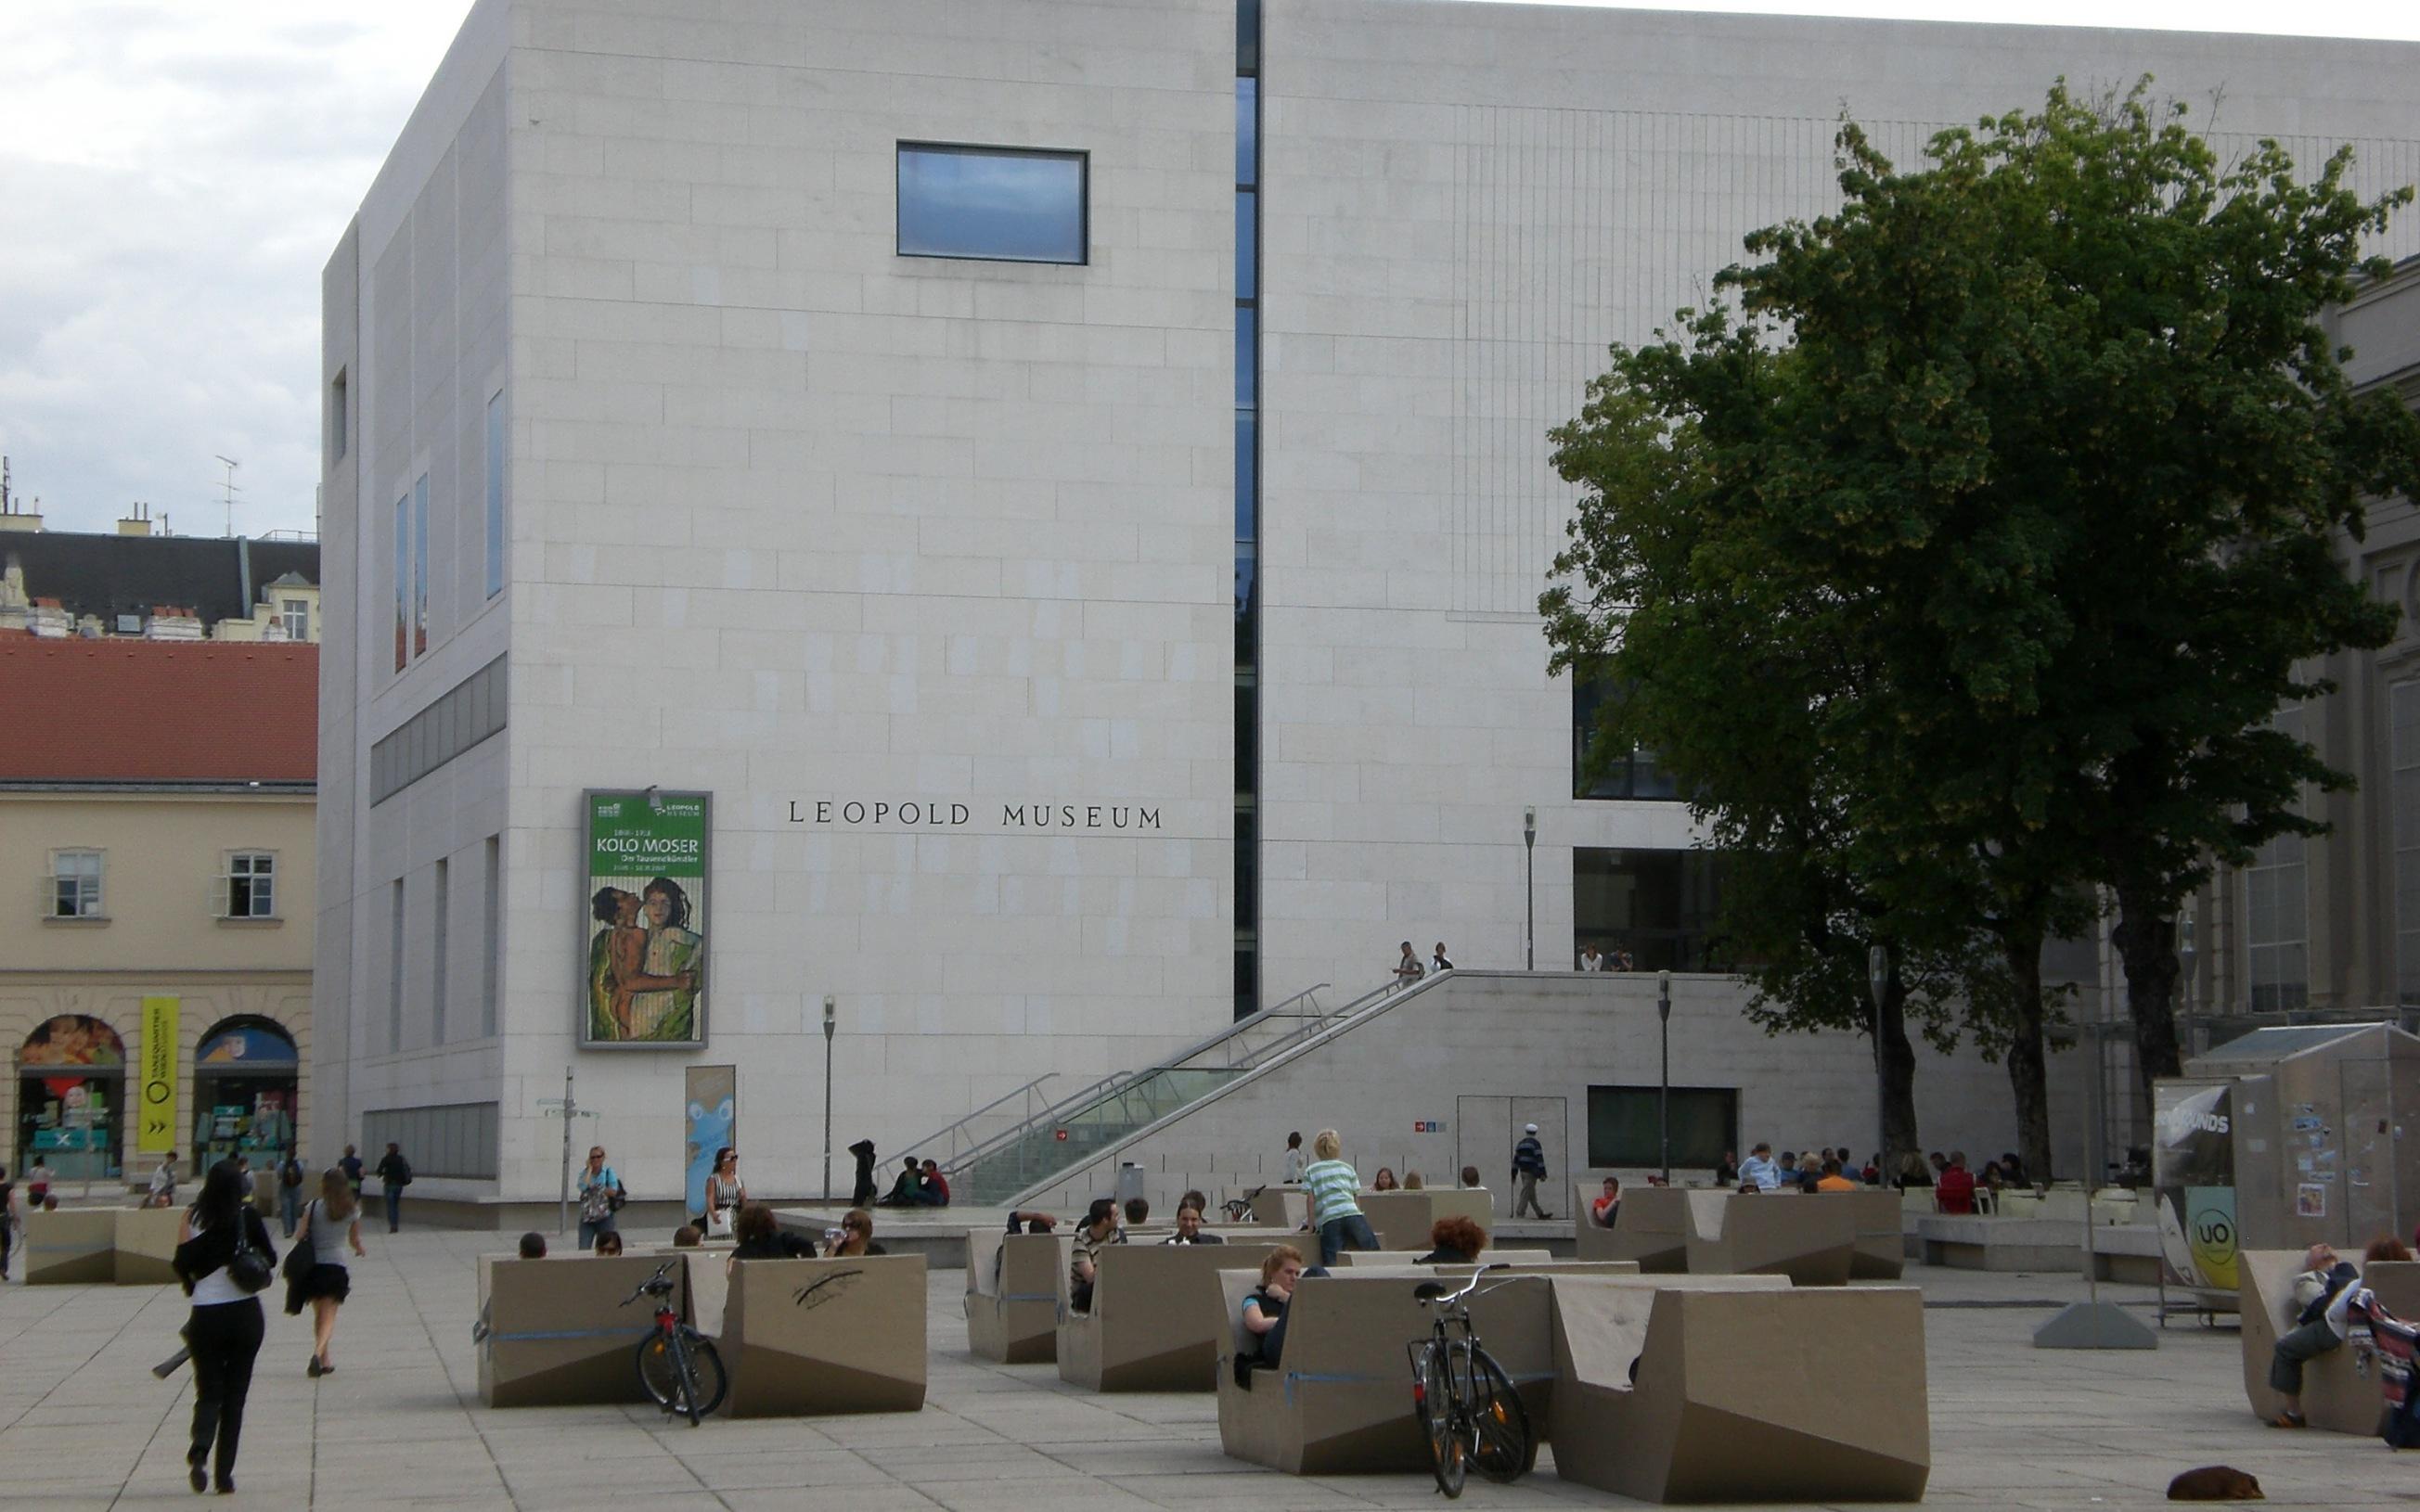 Österreich, Wien, Leopold Museum